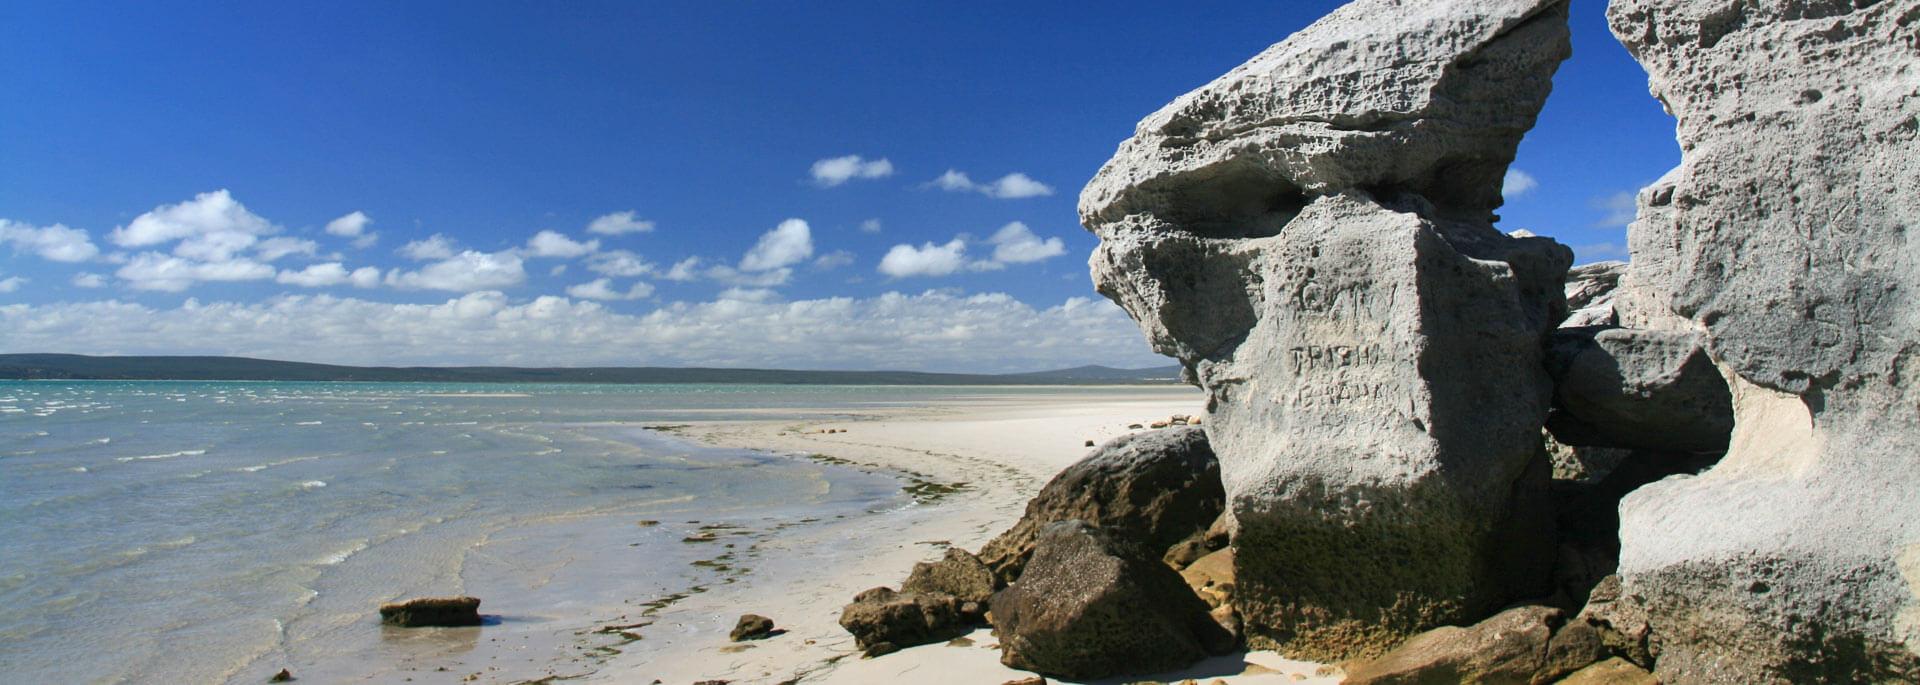 Fotos: Südafrika Westkap